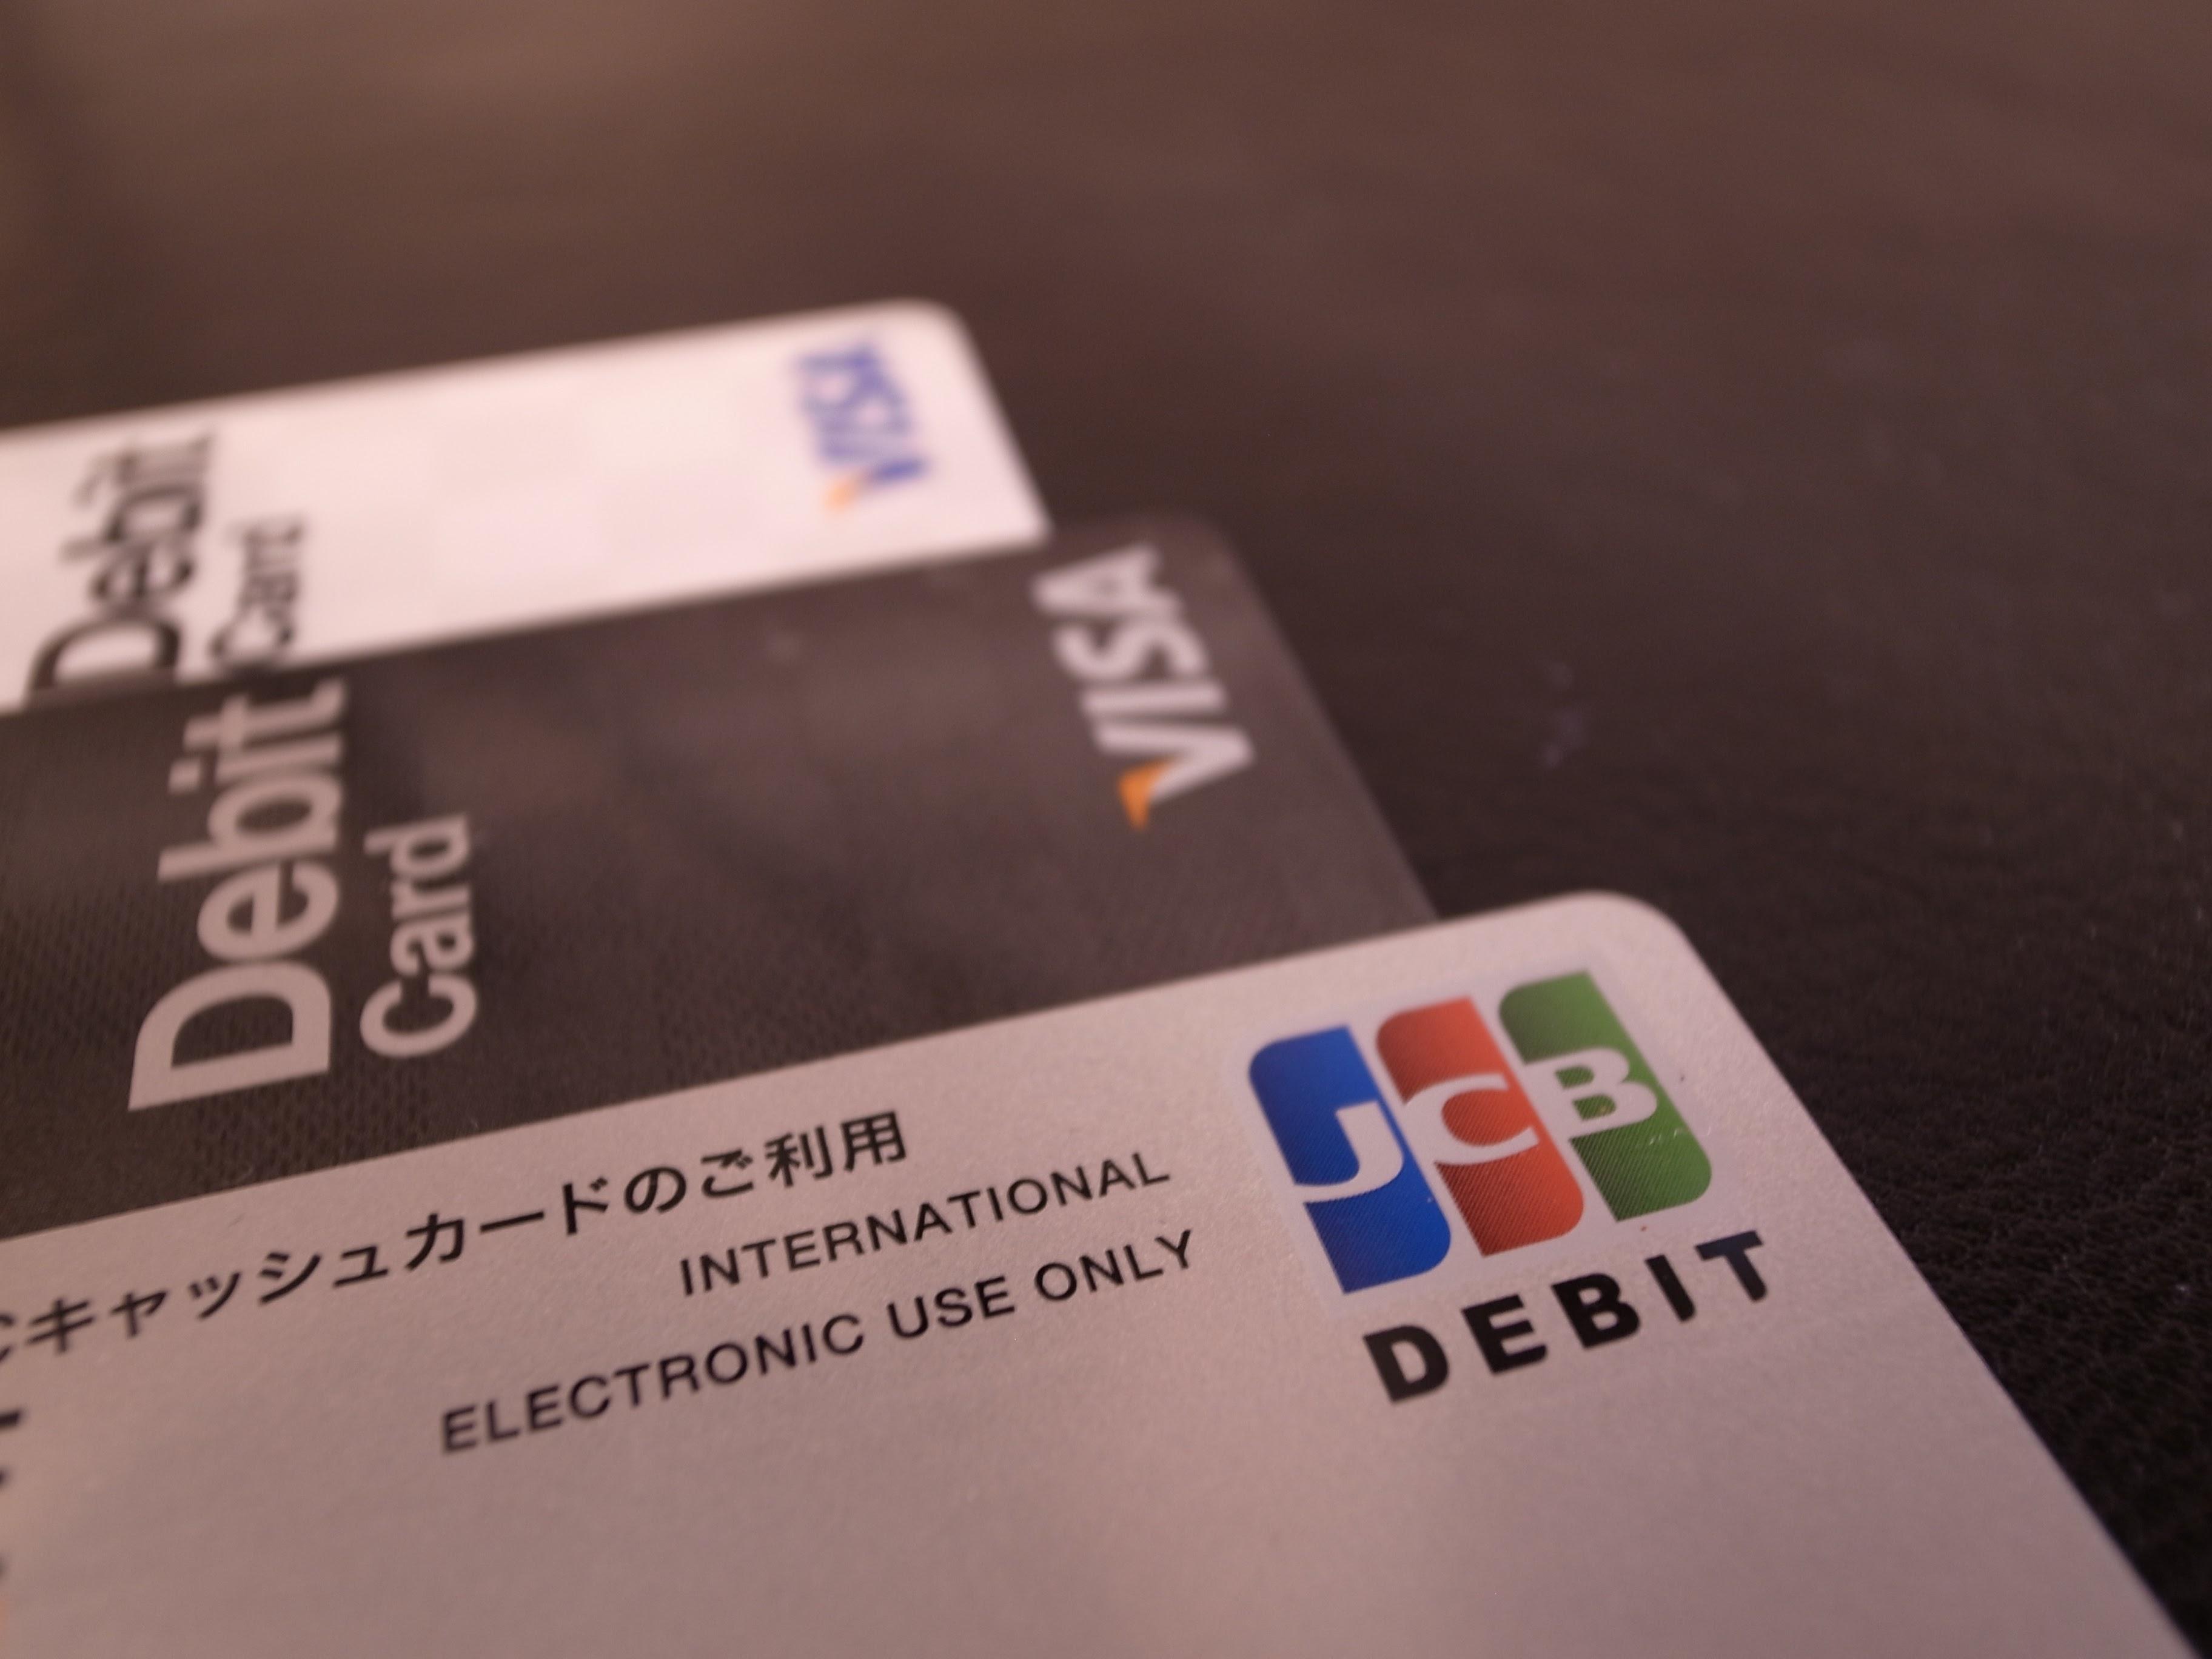 0871 201507 visa jcb debit 01